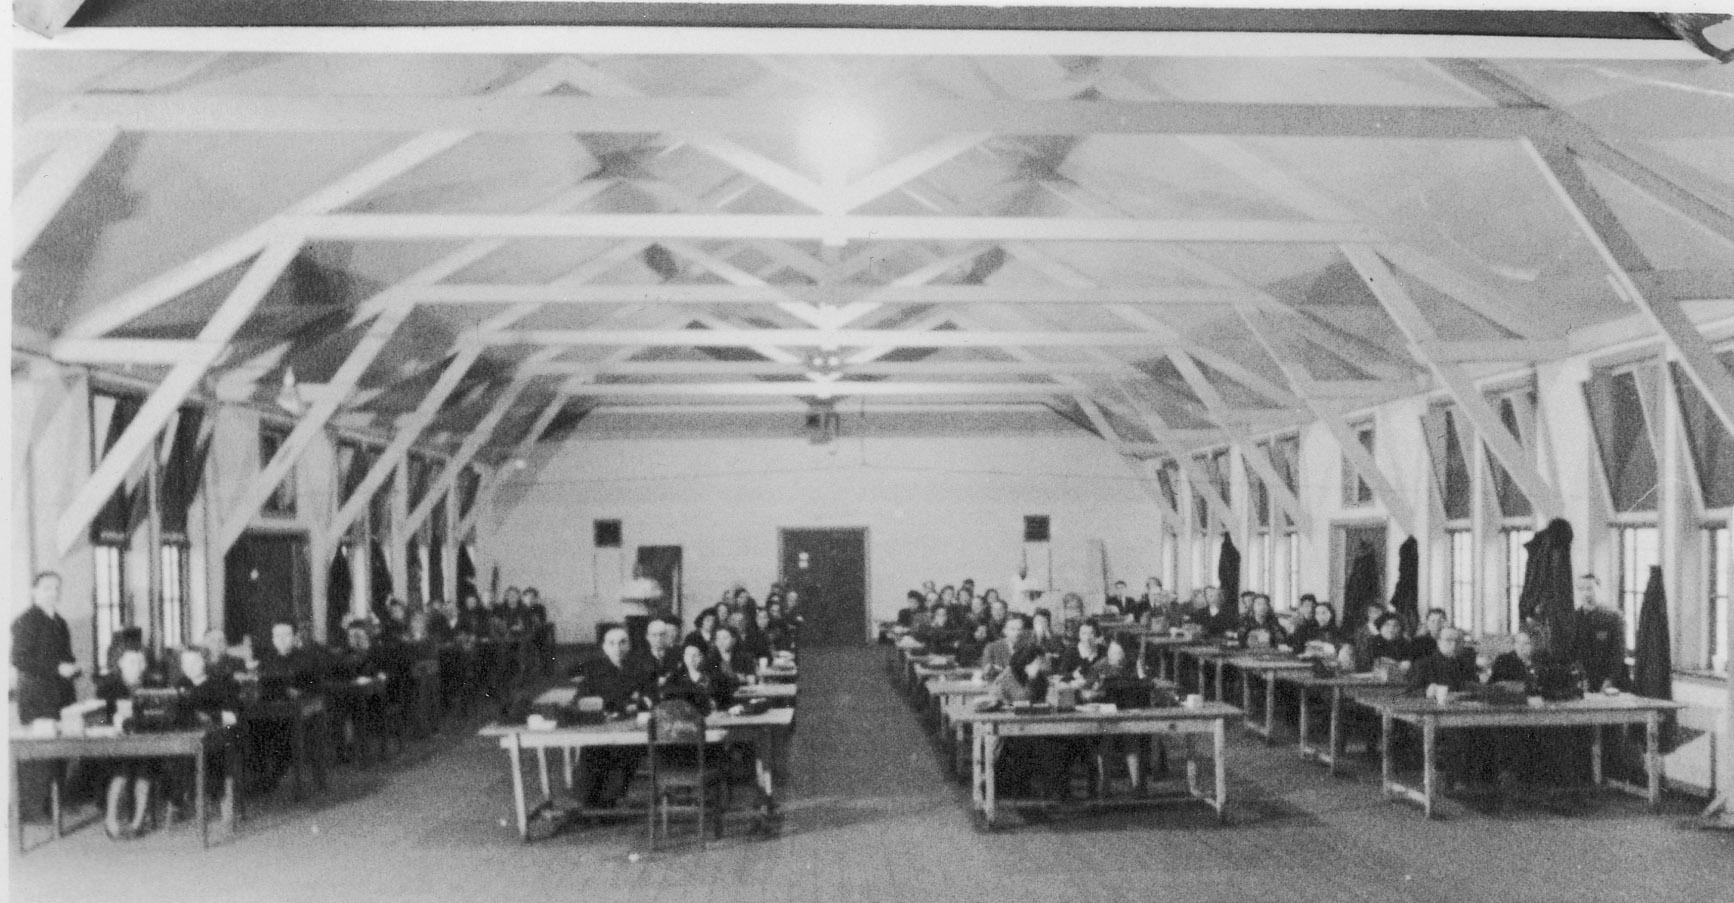 Registratie in kamp Westerbork.